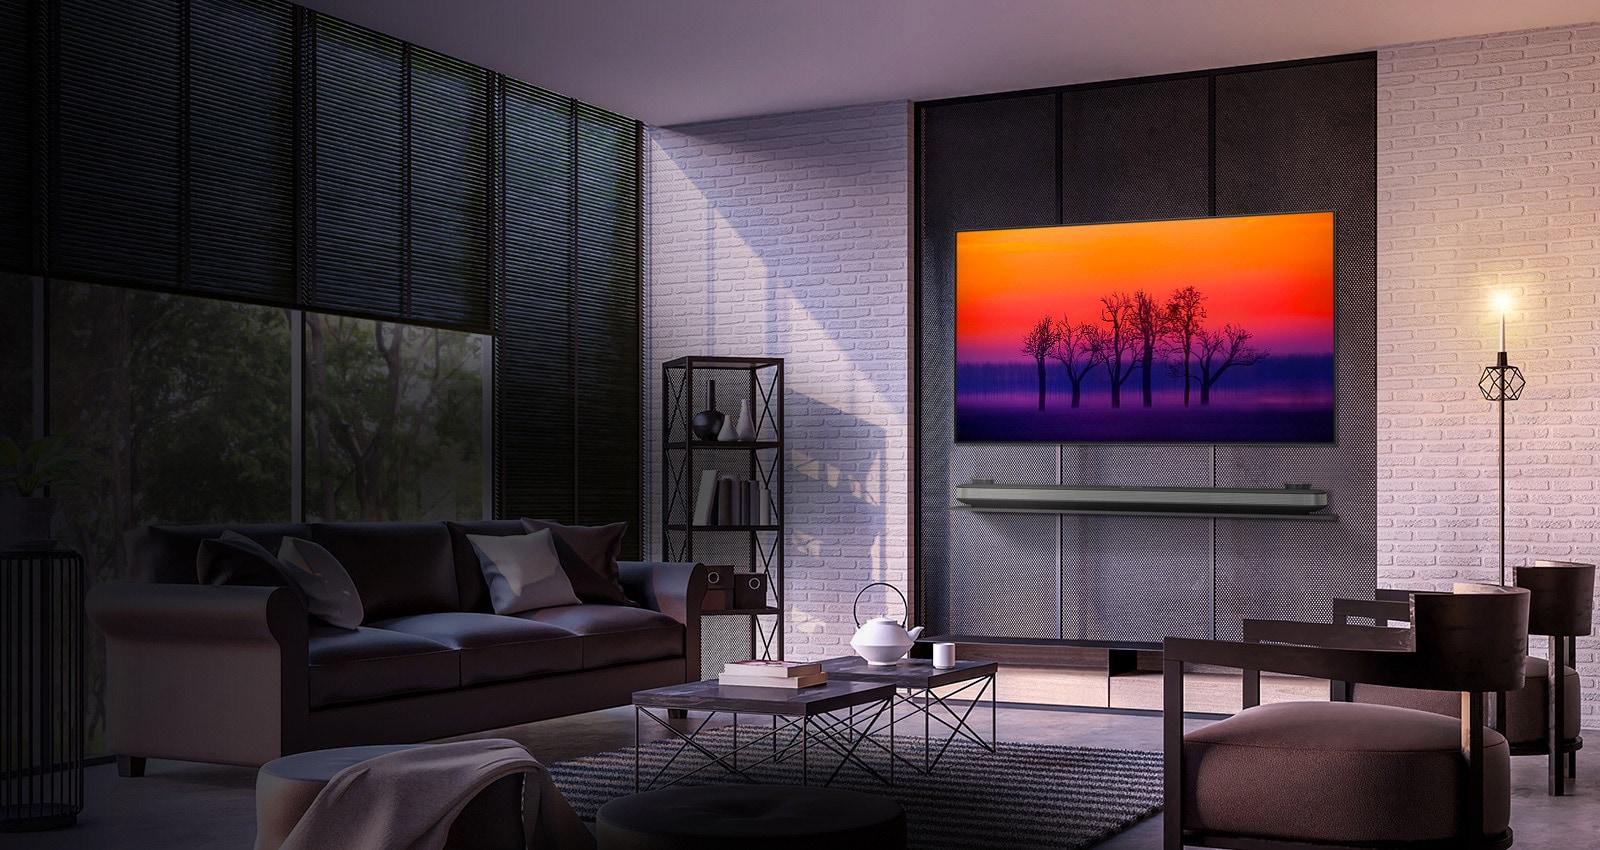 LG W8 OLED TV SIGNATURE Wallpaper 65 Inch TV | LG Australia